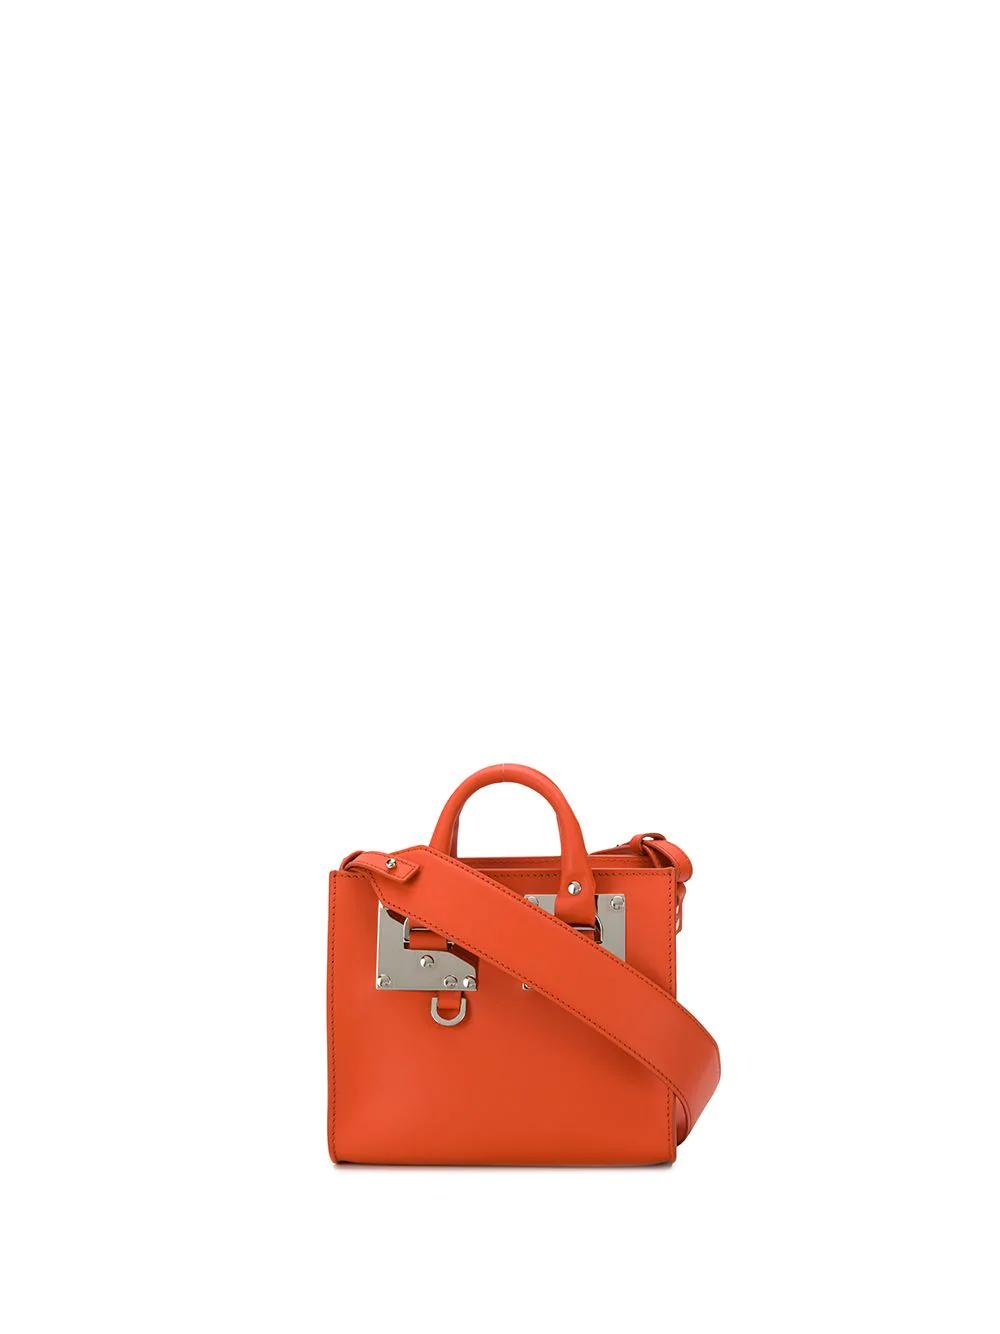 Sophie Hulme Albion Mini Bag - Orange